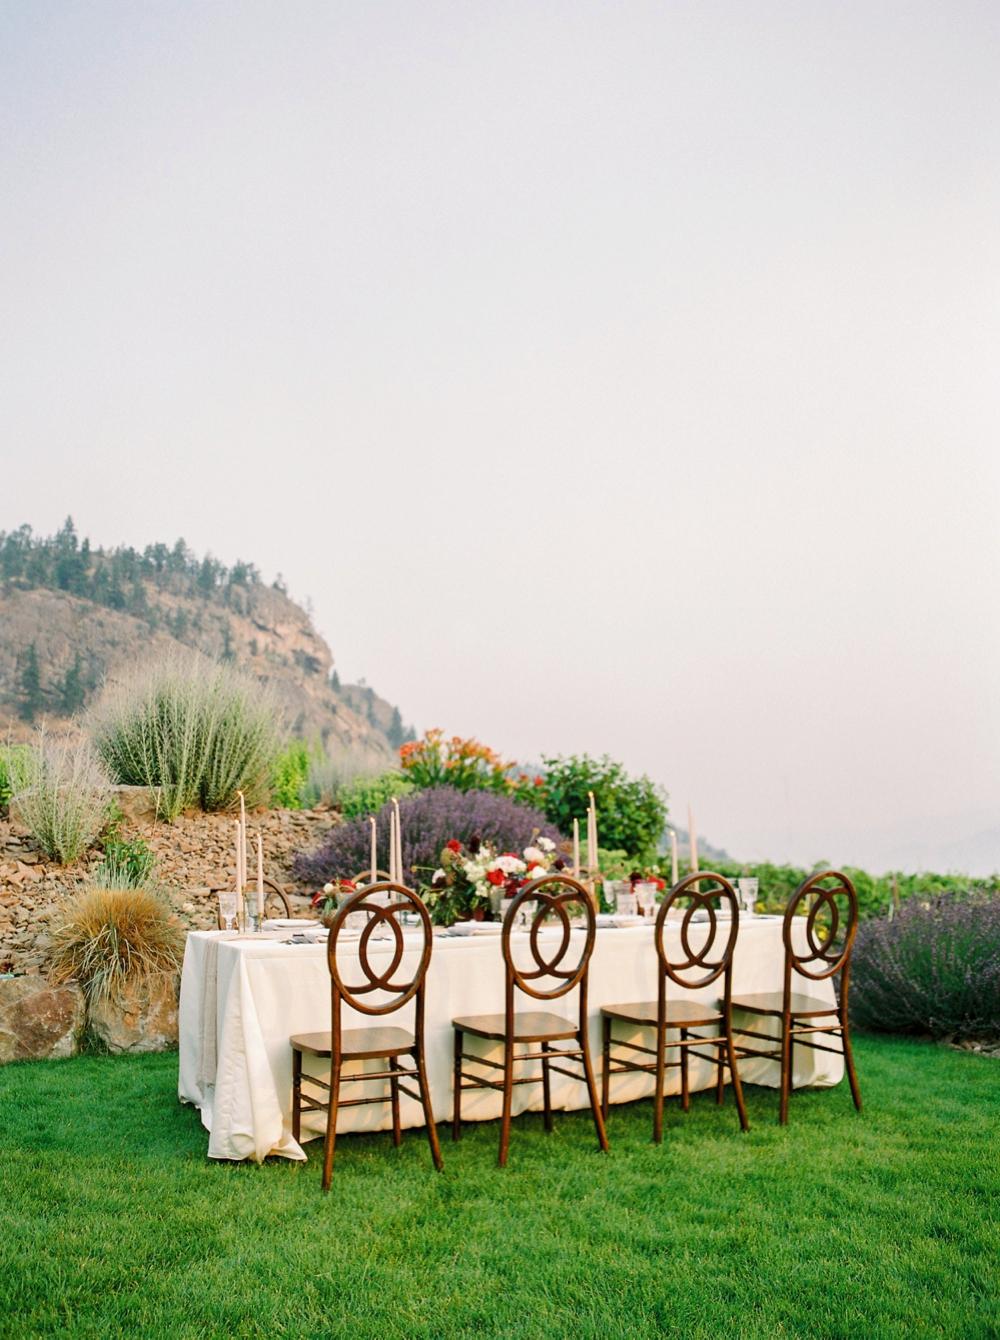 wedding table decor   Painted Rock Winery   Penticton wedding photographer   Kelowna Wedding photography   Okanagan Wedding photographers   Justine Milton fine art film